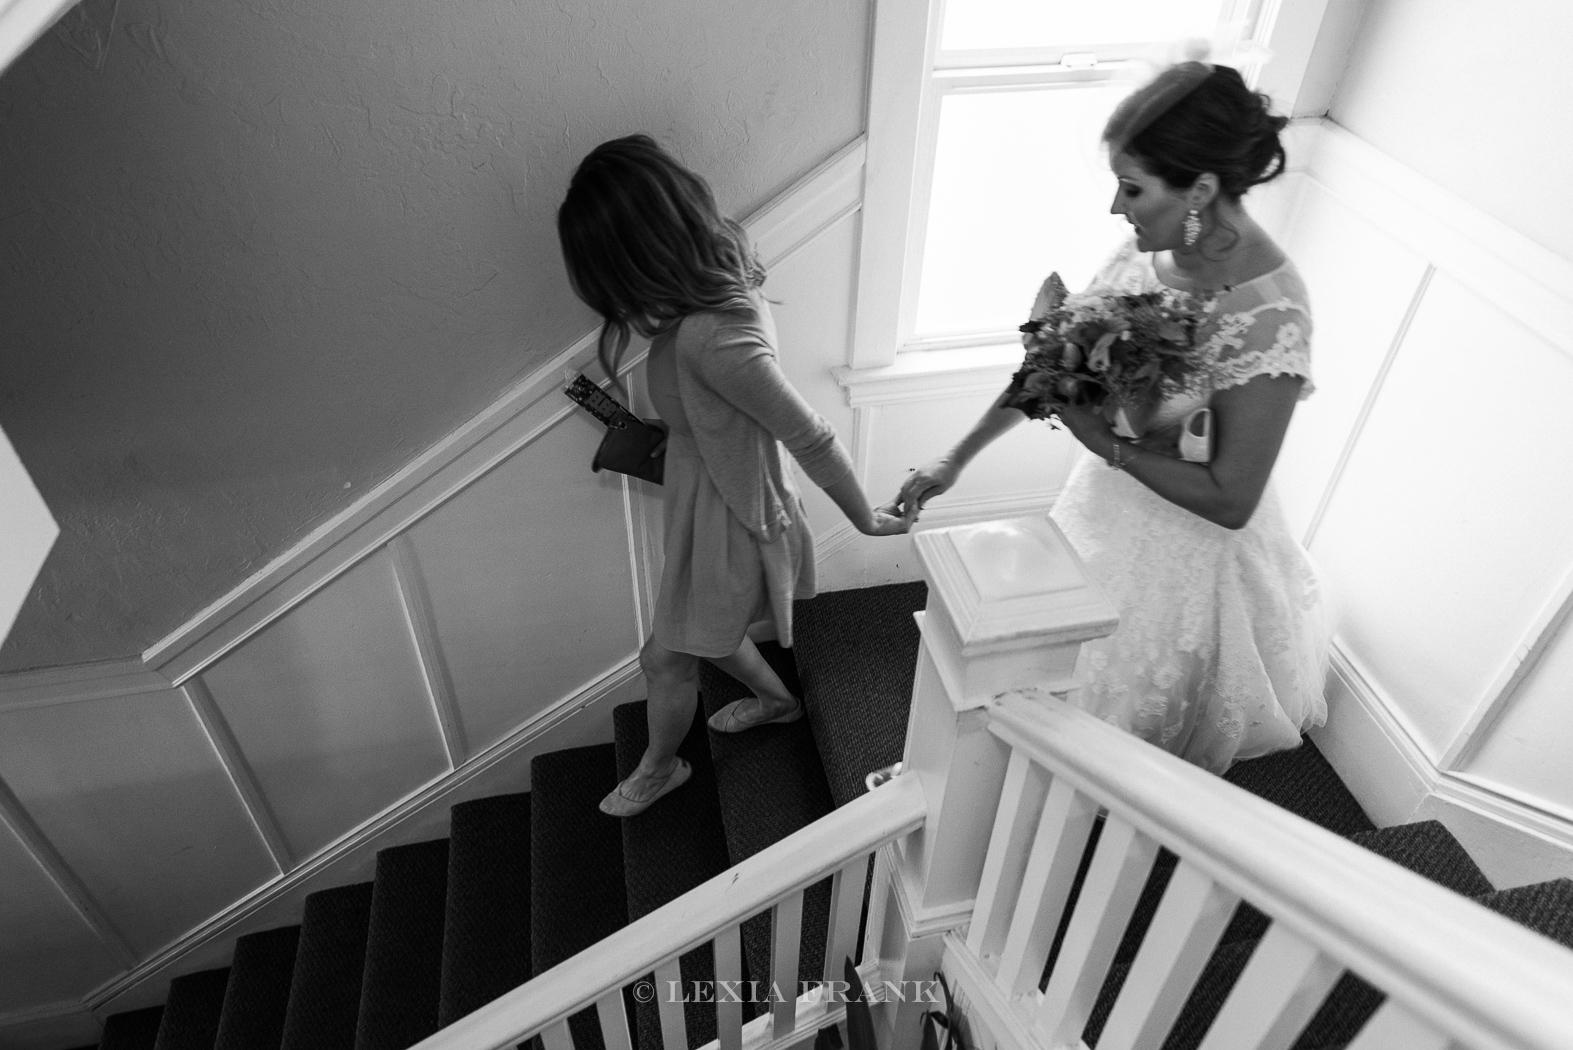 Destination Wedding Photographer Lexia Frank - a portland fine art film photographer - photographs a San Francisco City Hall Wedding in San Francisco as bride gets ready. www.lexiafrank.com